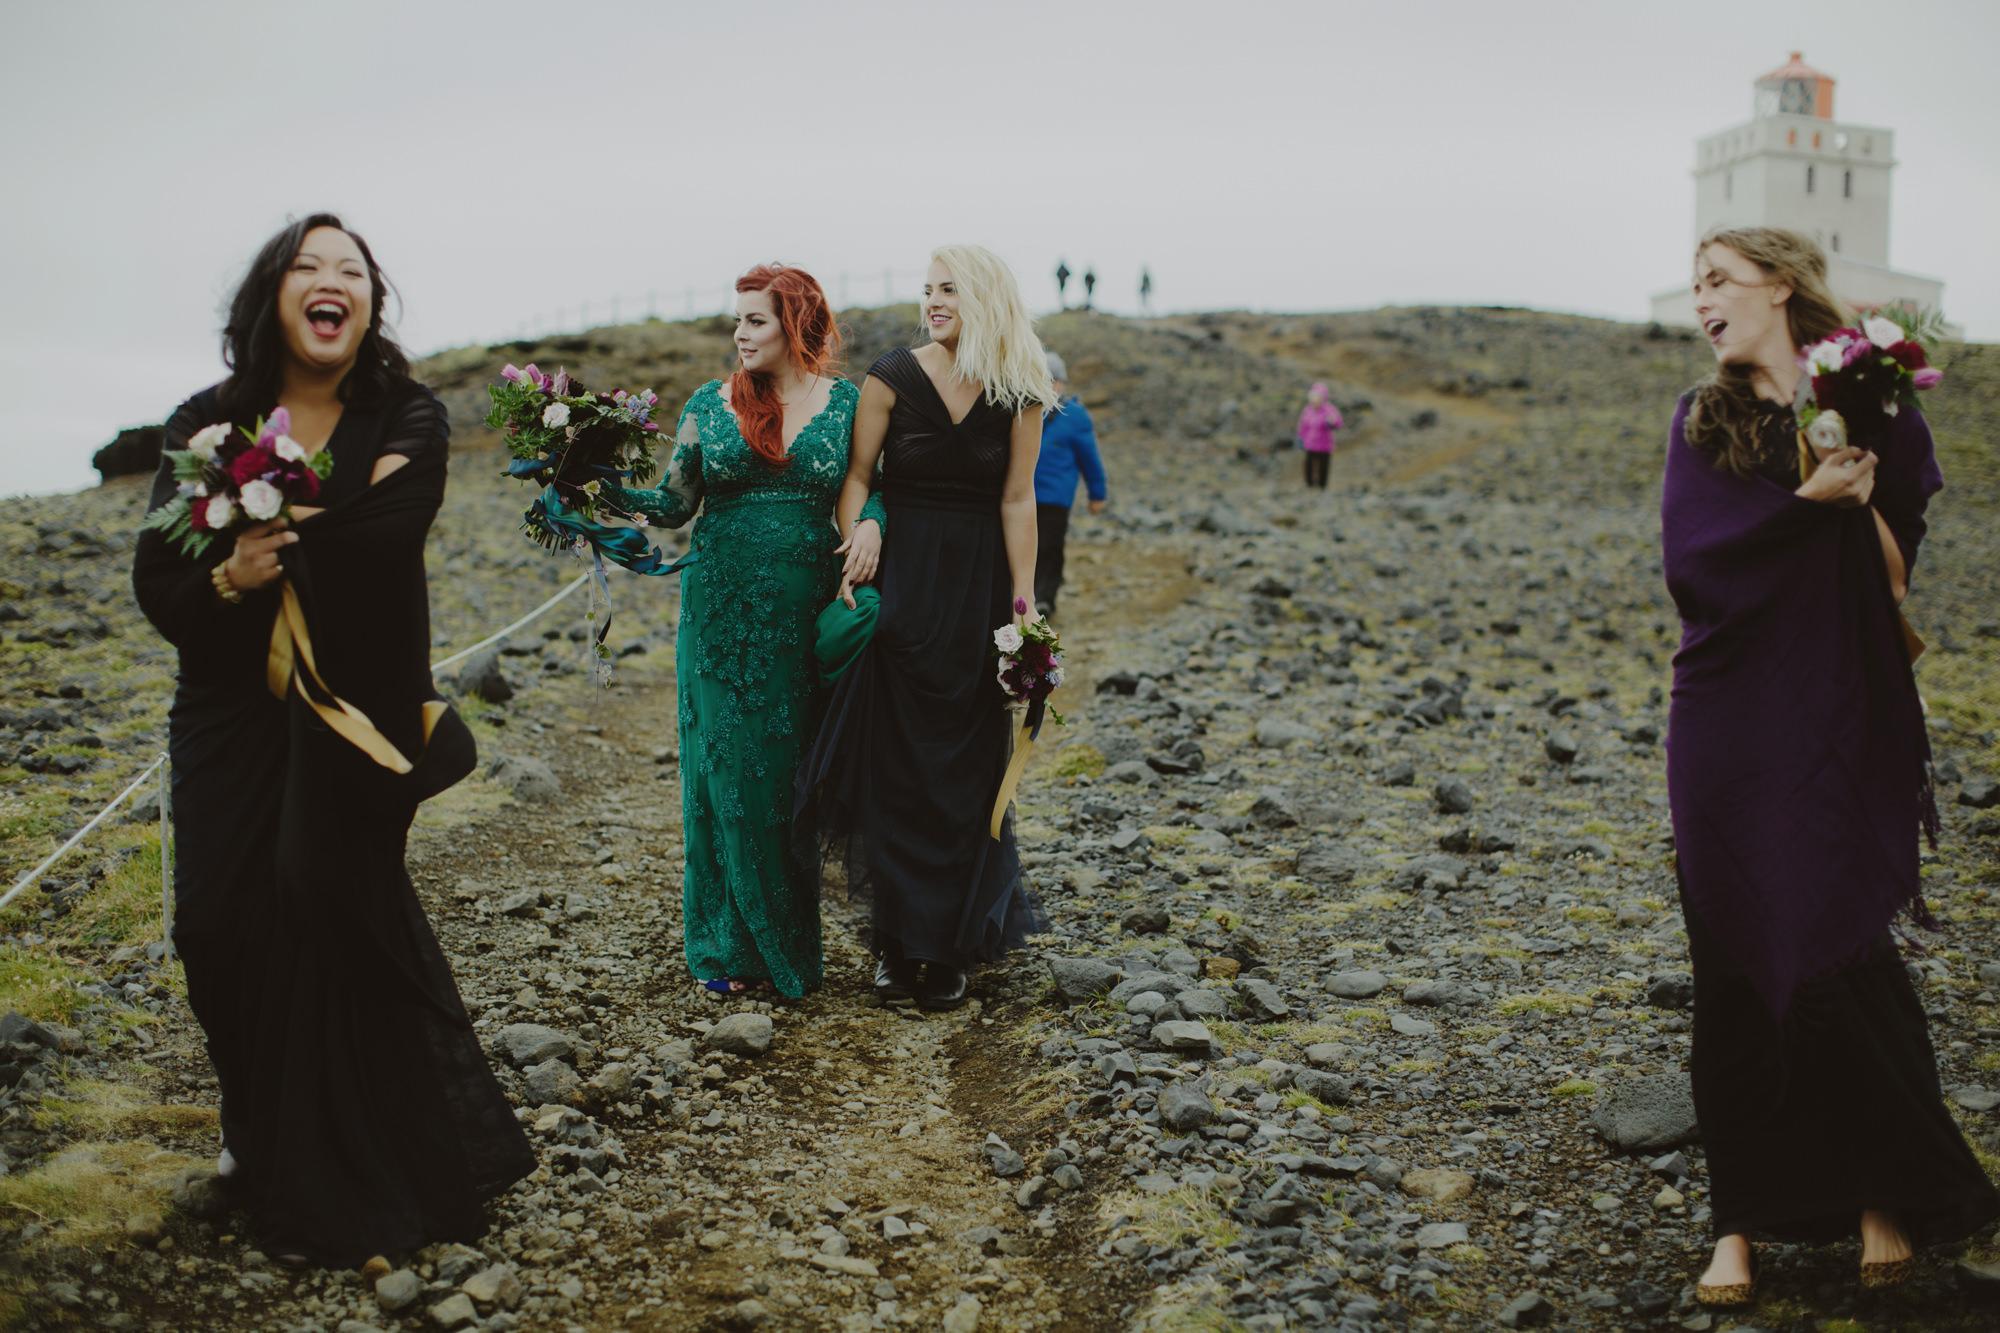 iceland_elopement_wedding_sammblake_030.jpg